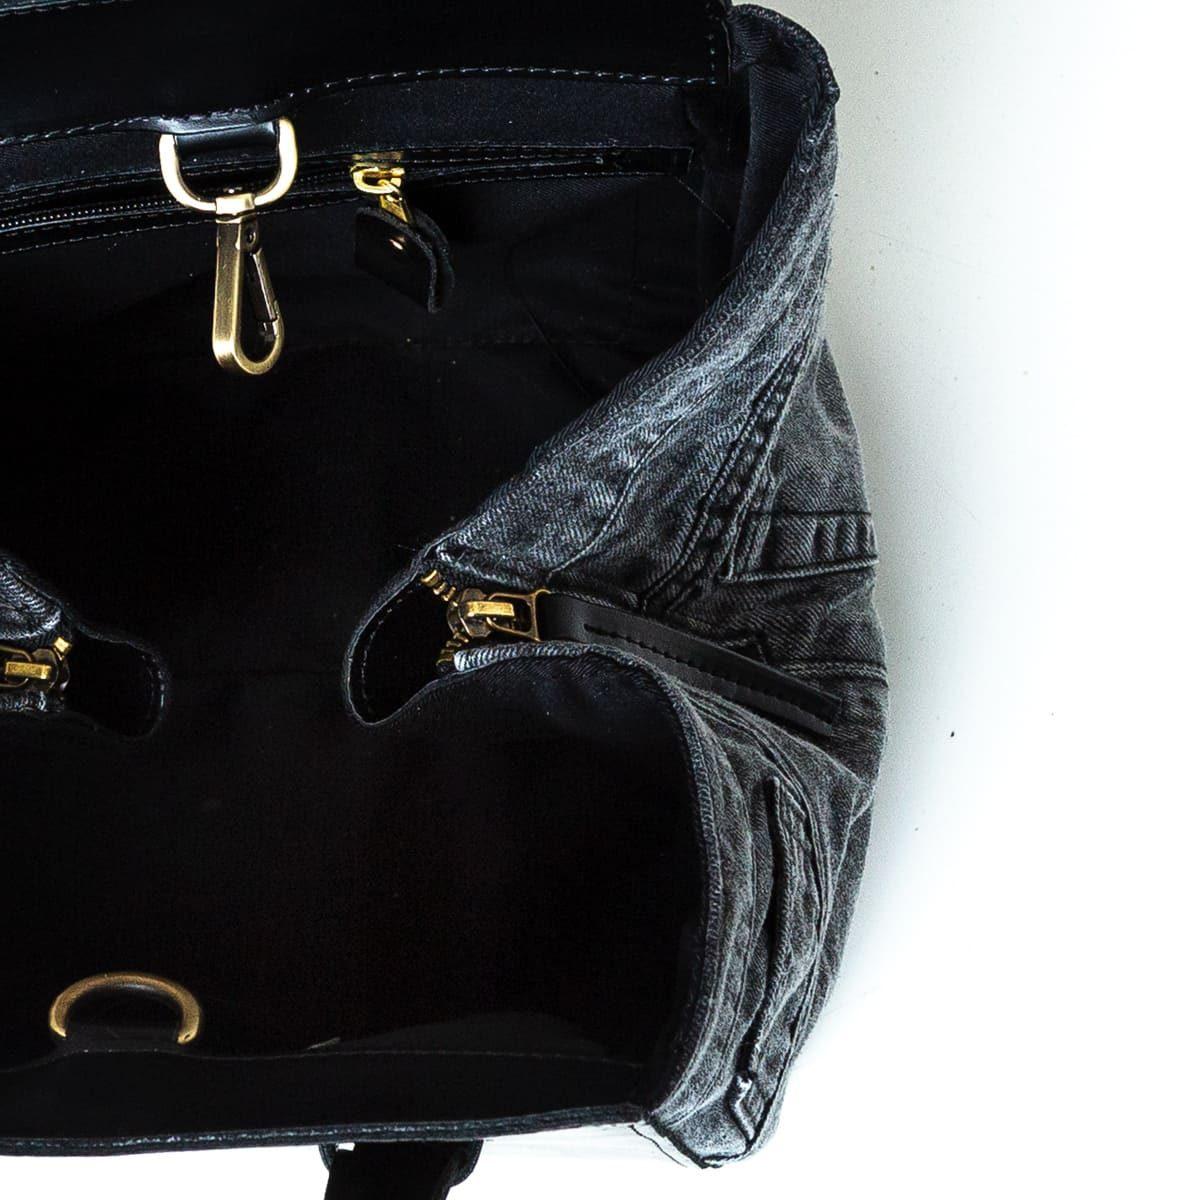 salt & pepper jeans denim bags elena athanasiou